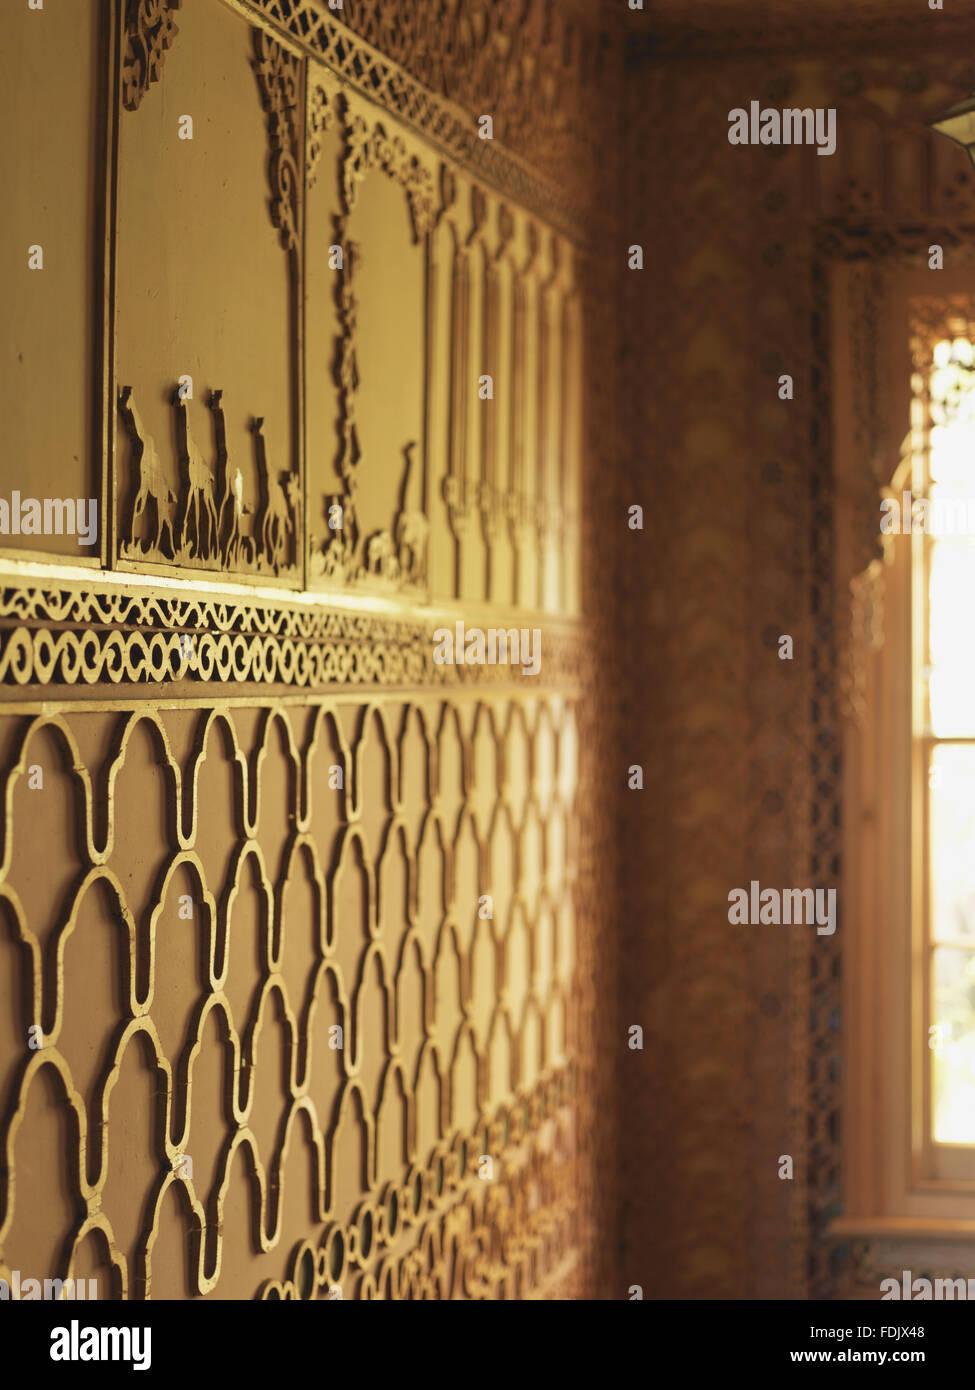 Decorative fretwork in the London home where poet Khadambi Asalache ...